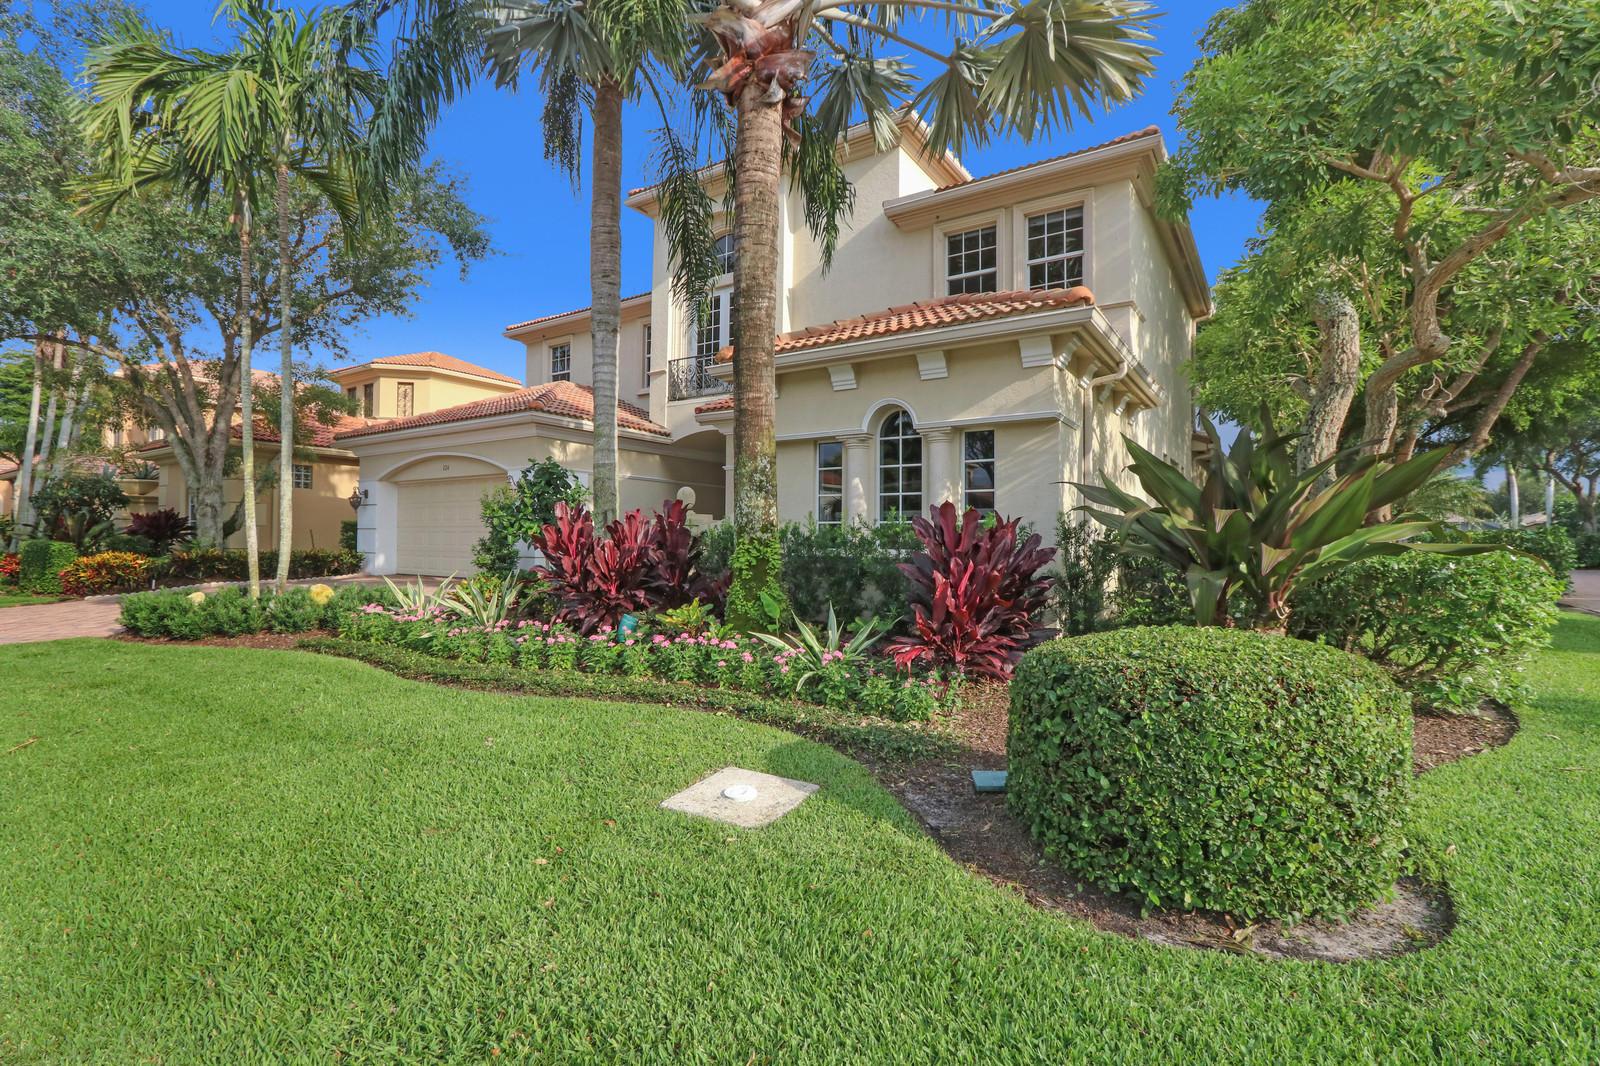 Photo of 126 Sunesta Cove Drive, Palm Beach Gardens, FL 33418